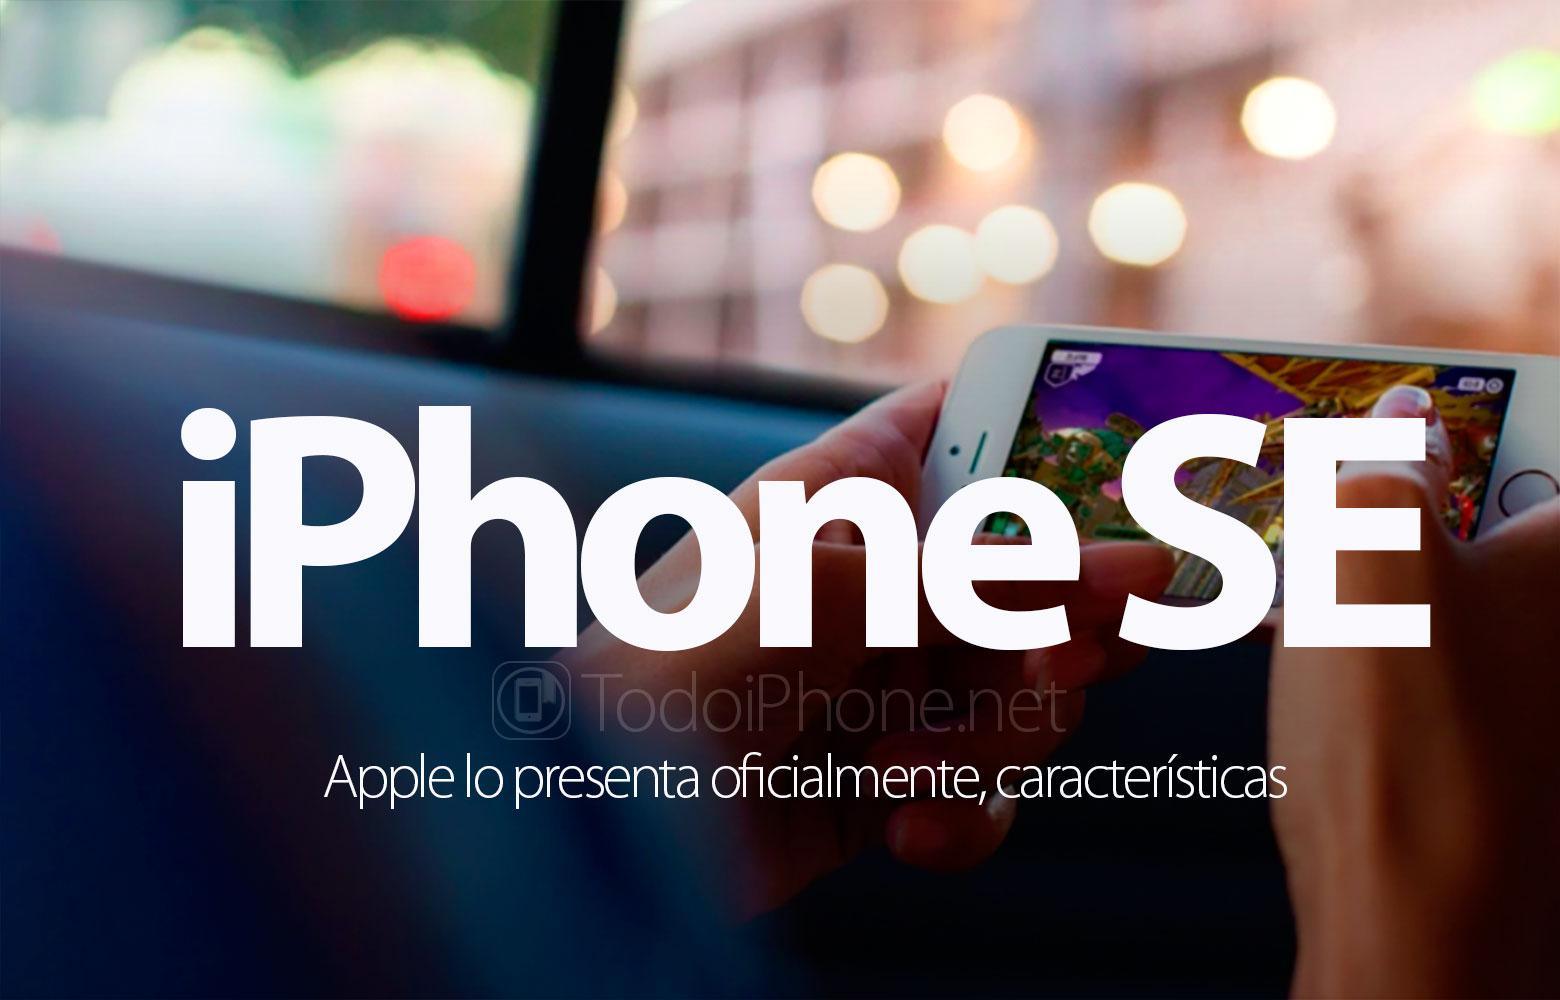 iphone-se-nuevo-smartphone-4-pulgadas-apple